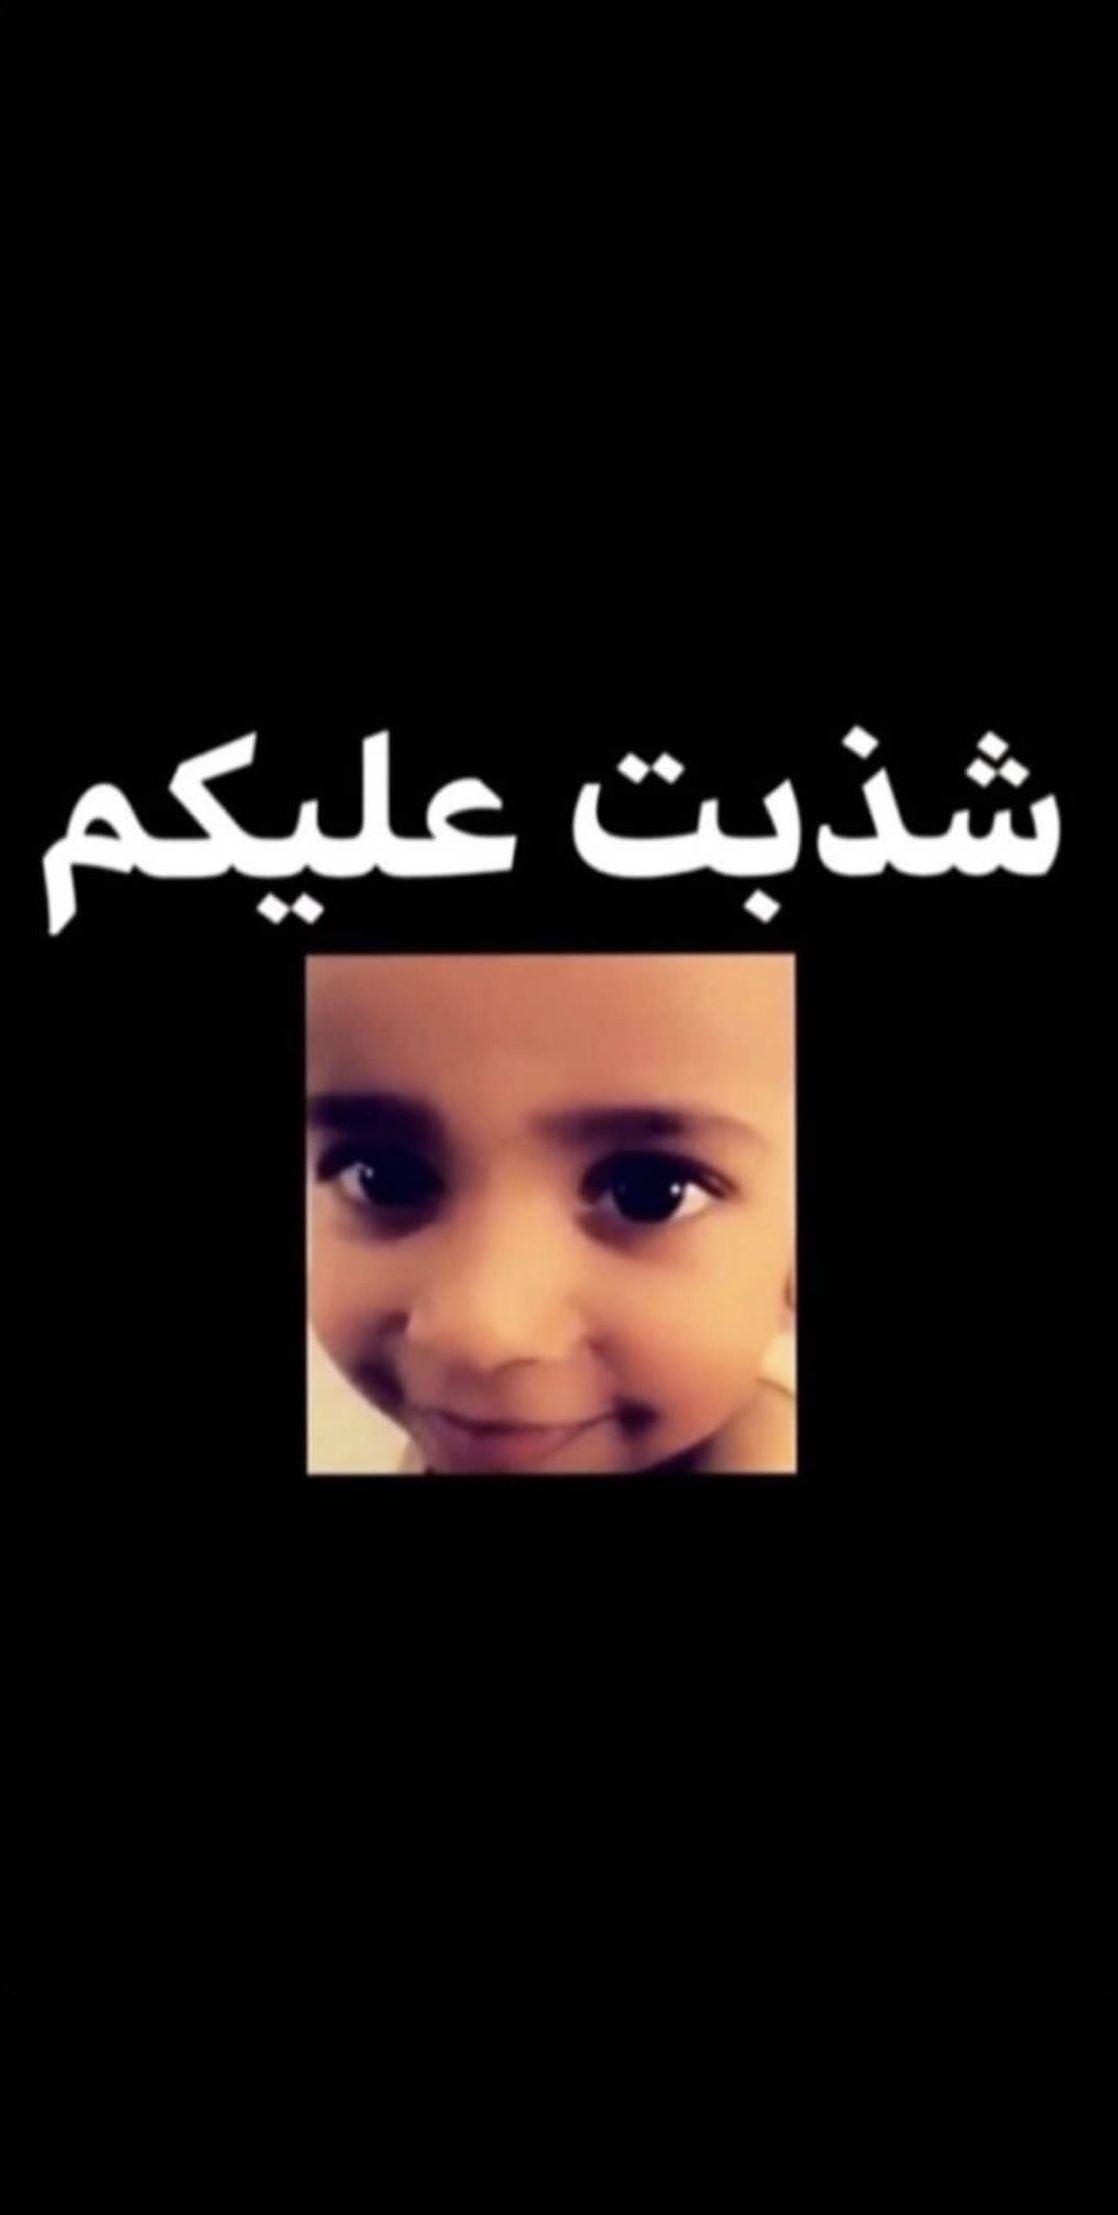 Pin By اسيره الزمان On ابتسموا ي جميلين Funny Photo Memes Arabic Funny Beautiful Arabic Words